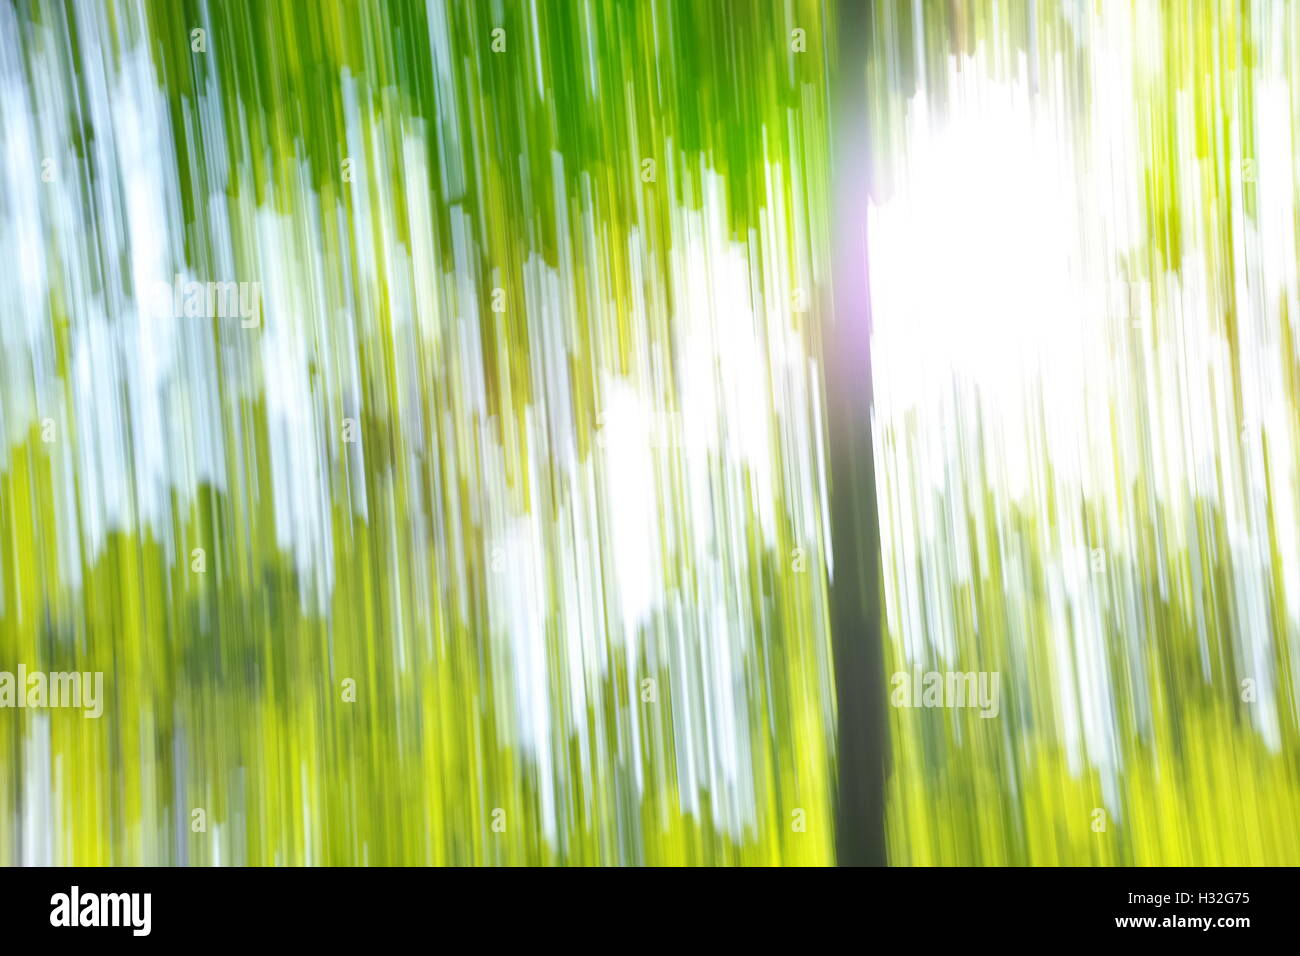 Geschwindigkeit Bäume Abstraktion Stockbild